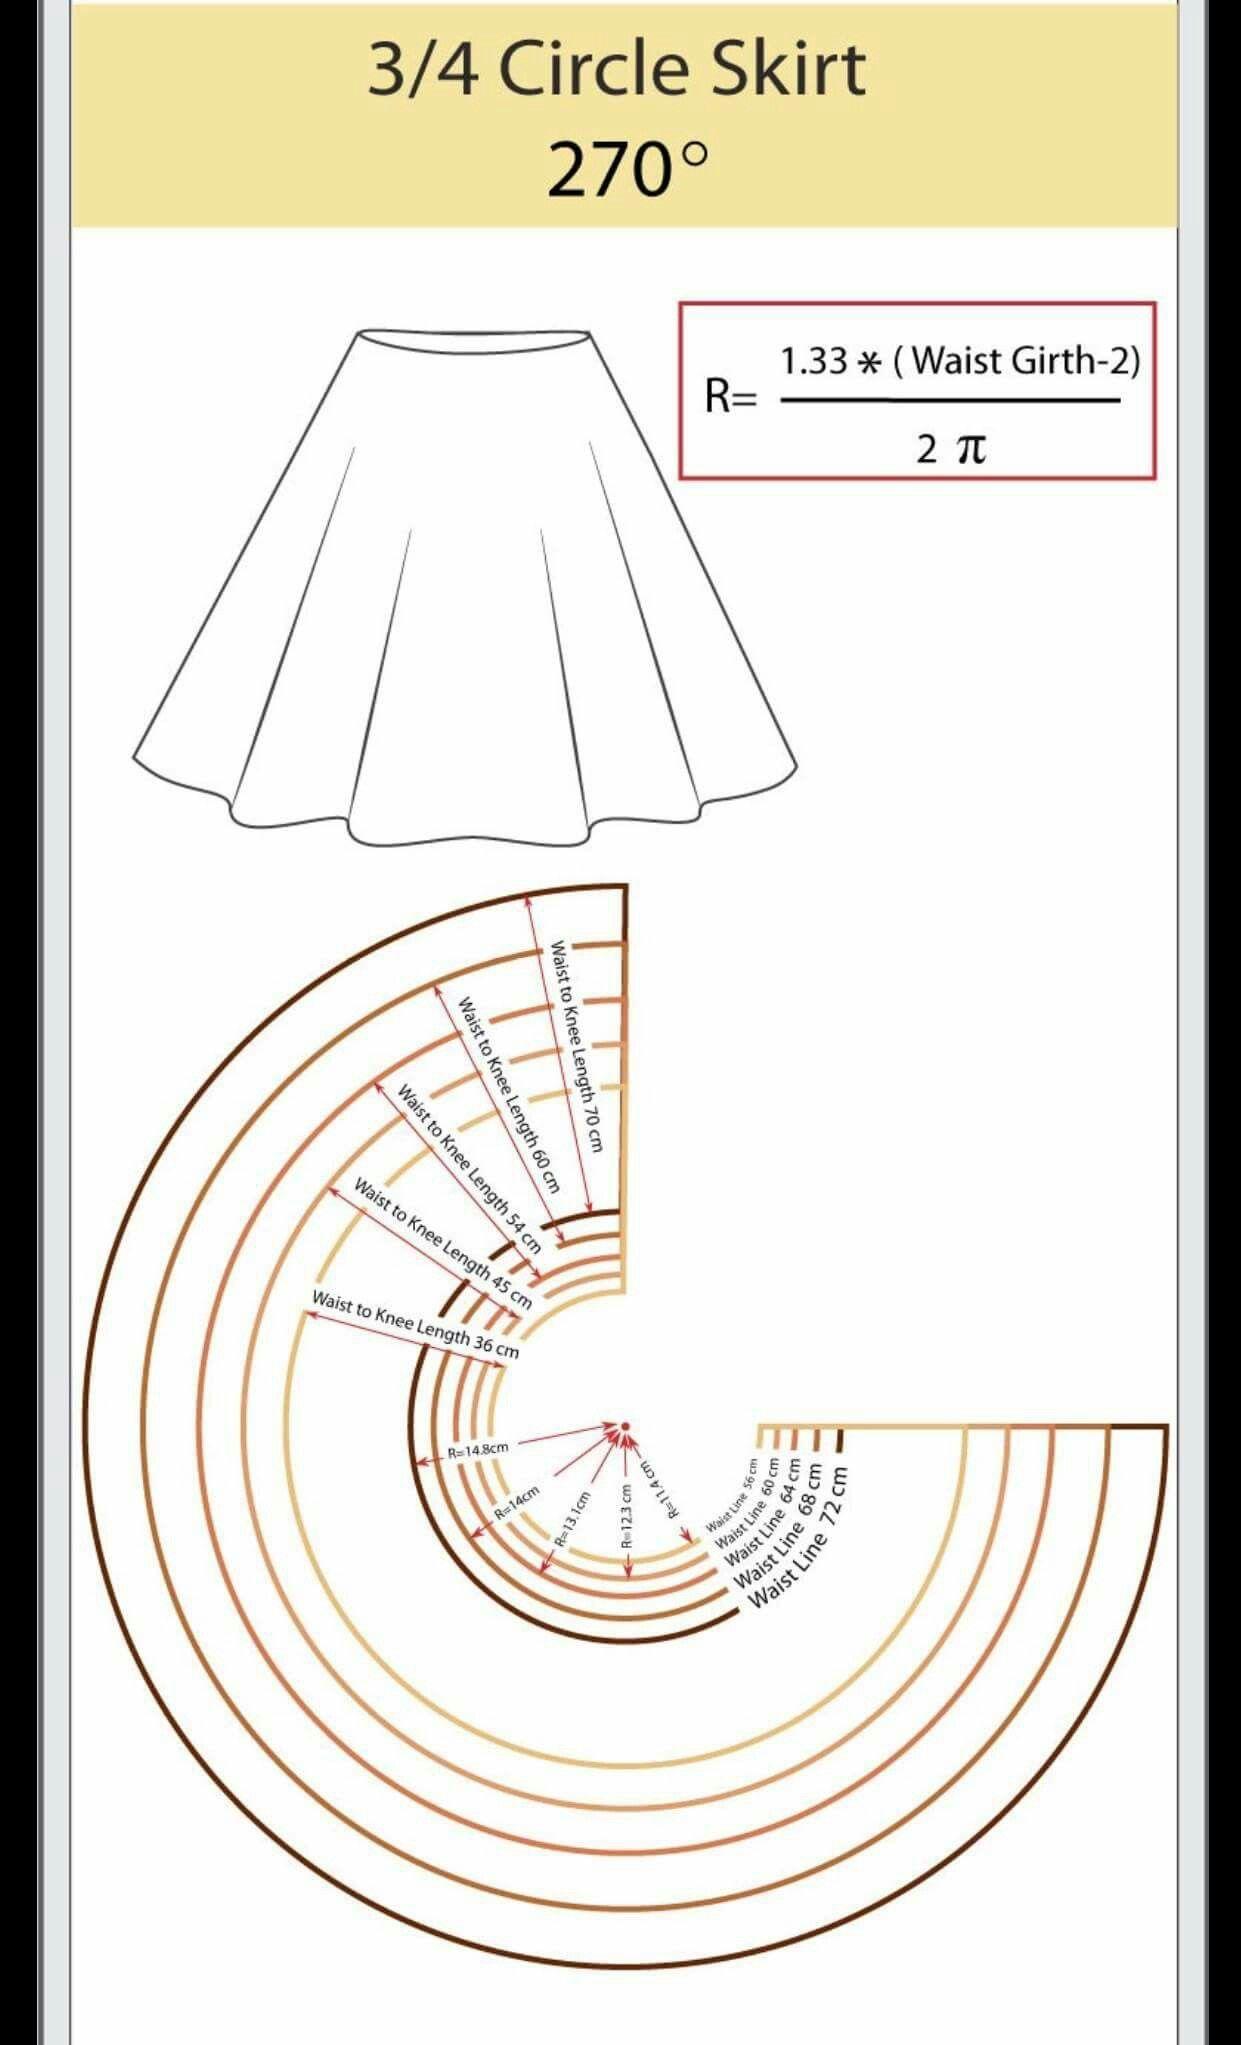 Pin de Katherin De la Rosa en Faldas-skirt   Pinterest   Falda